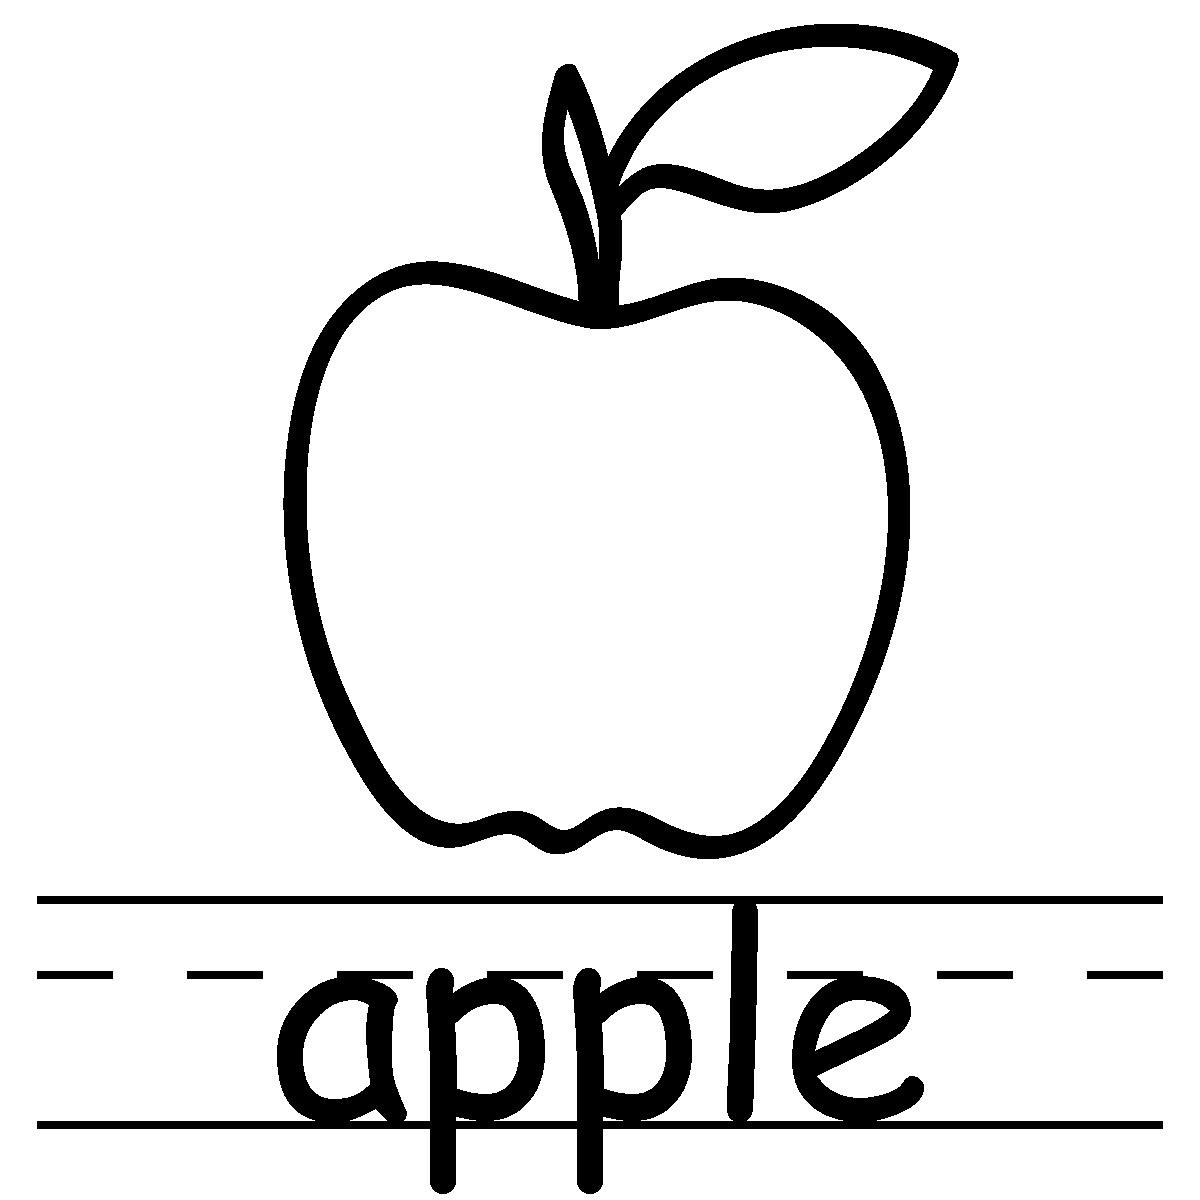 Free Teacher Apple Clipart Download Free Clip Art Free